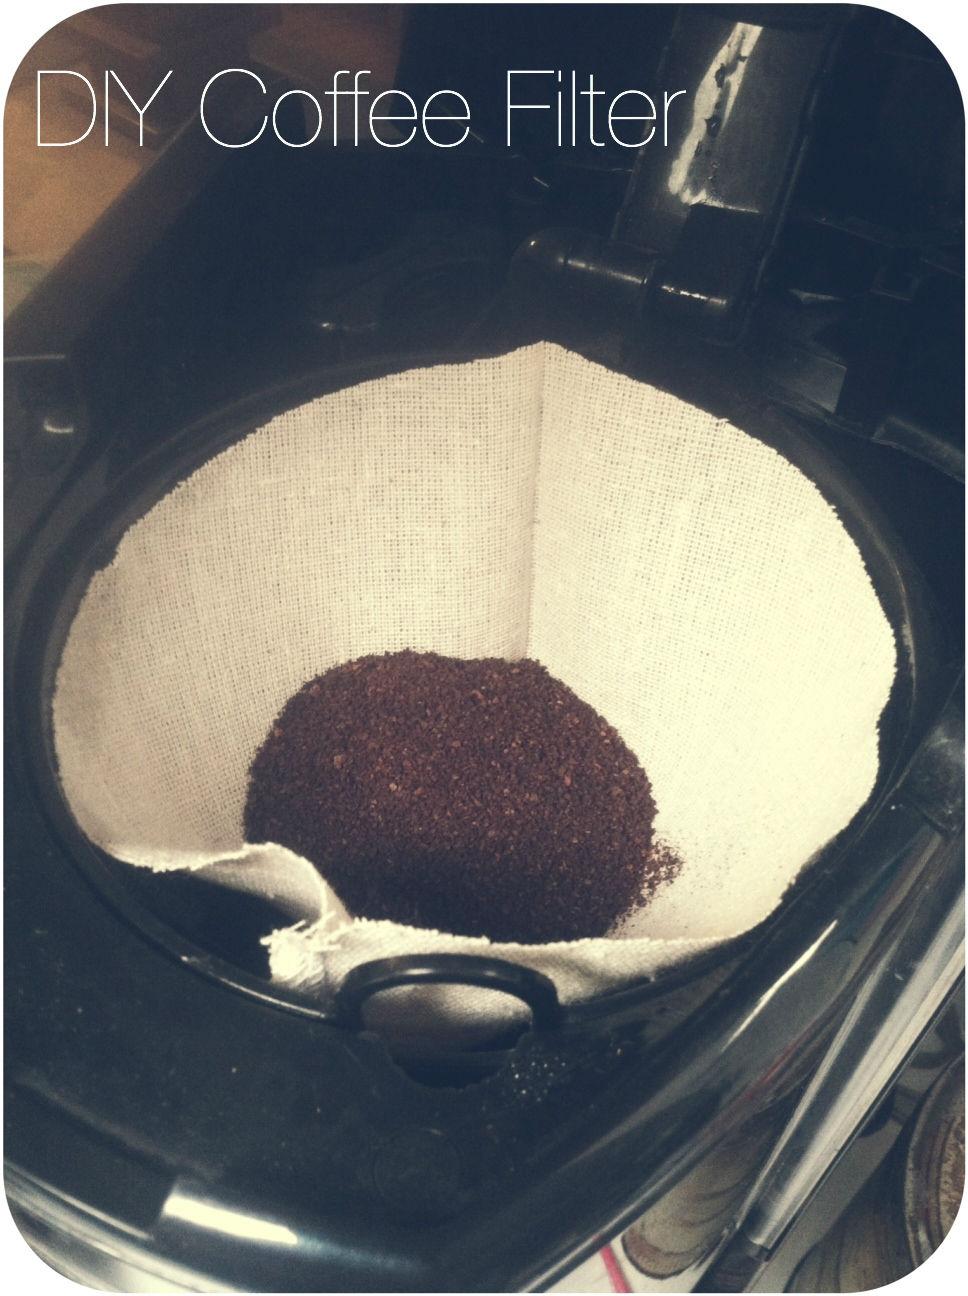 Chevron Stitches Diy Reusable Coffee Filter